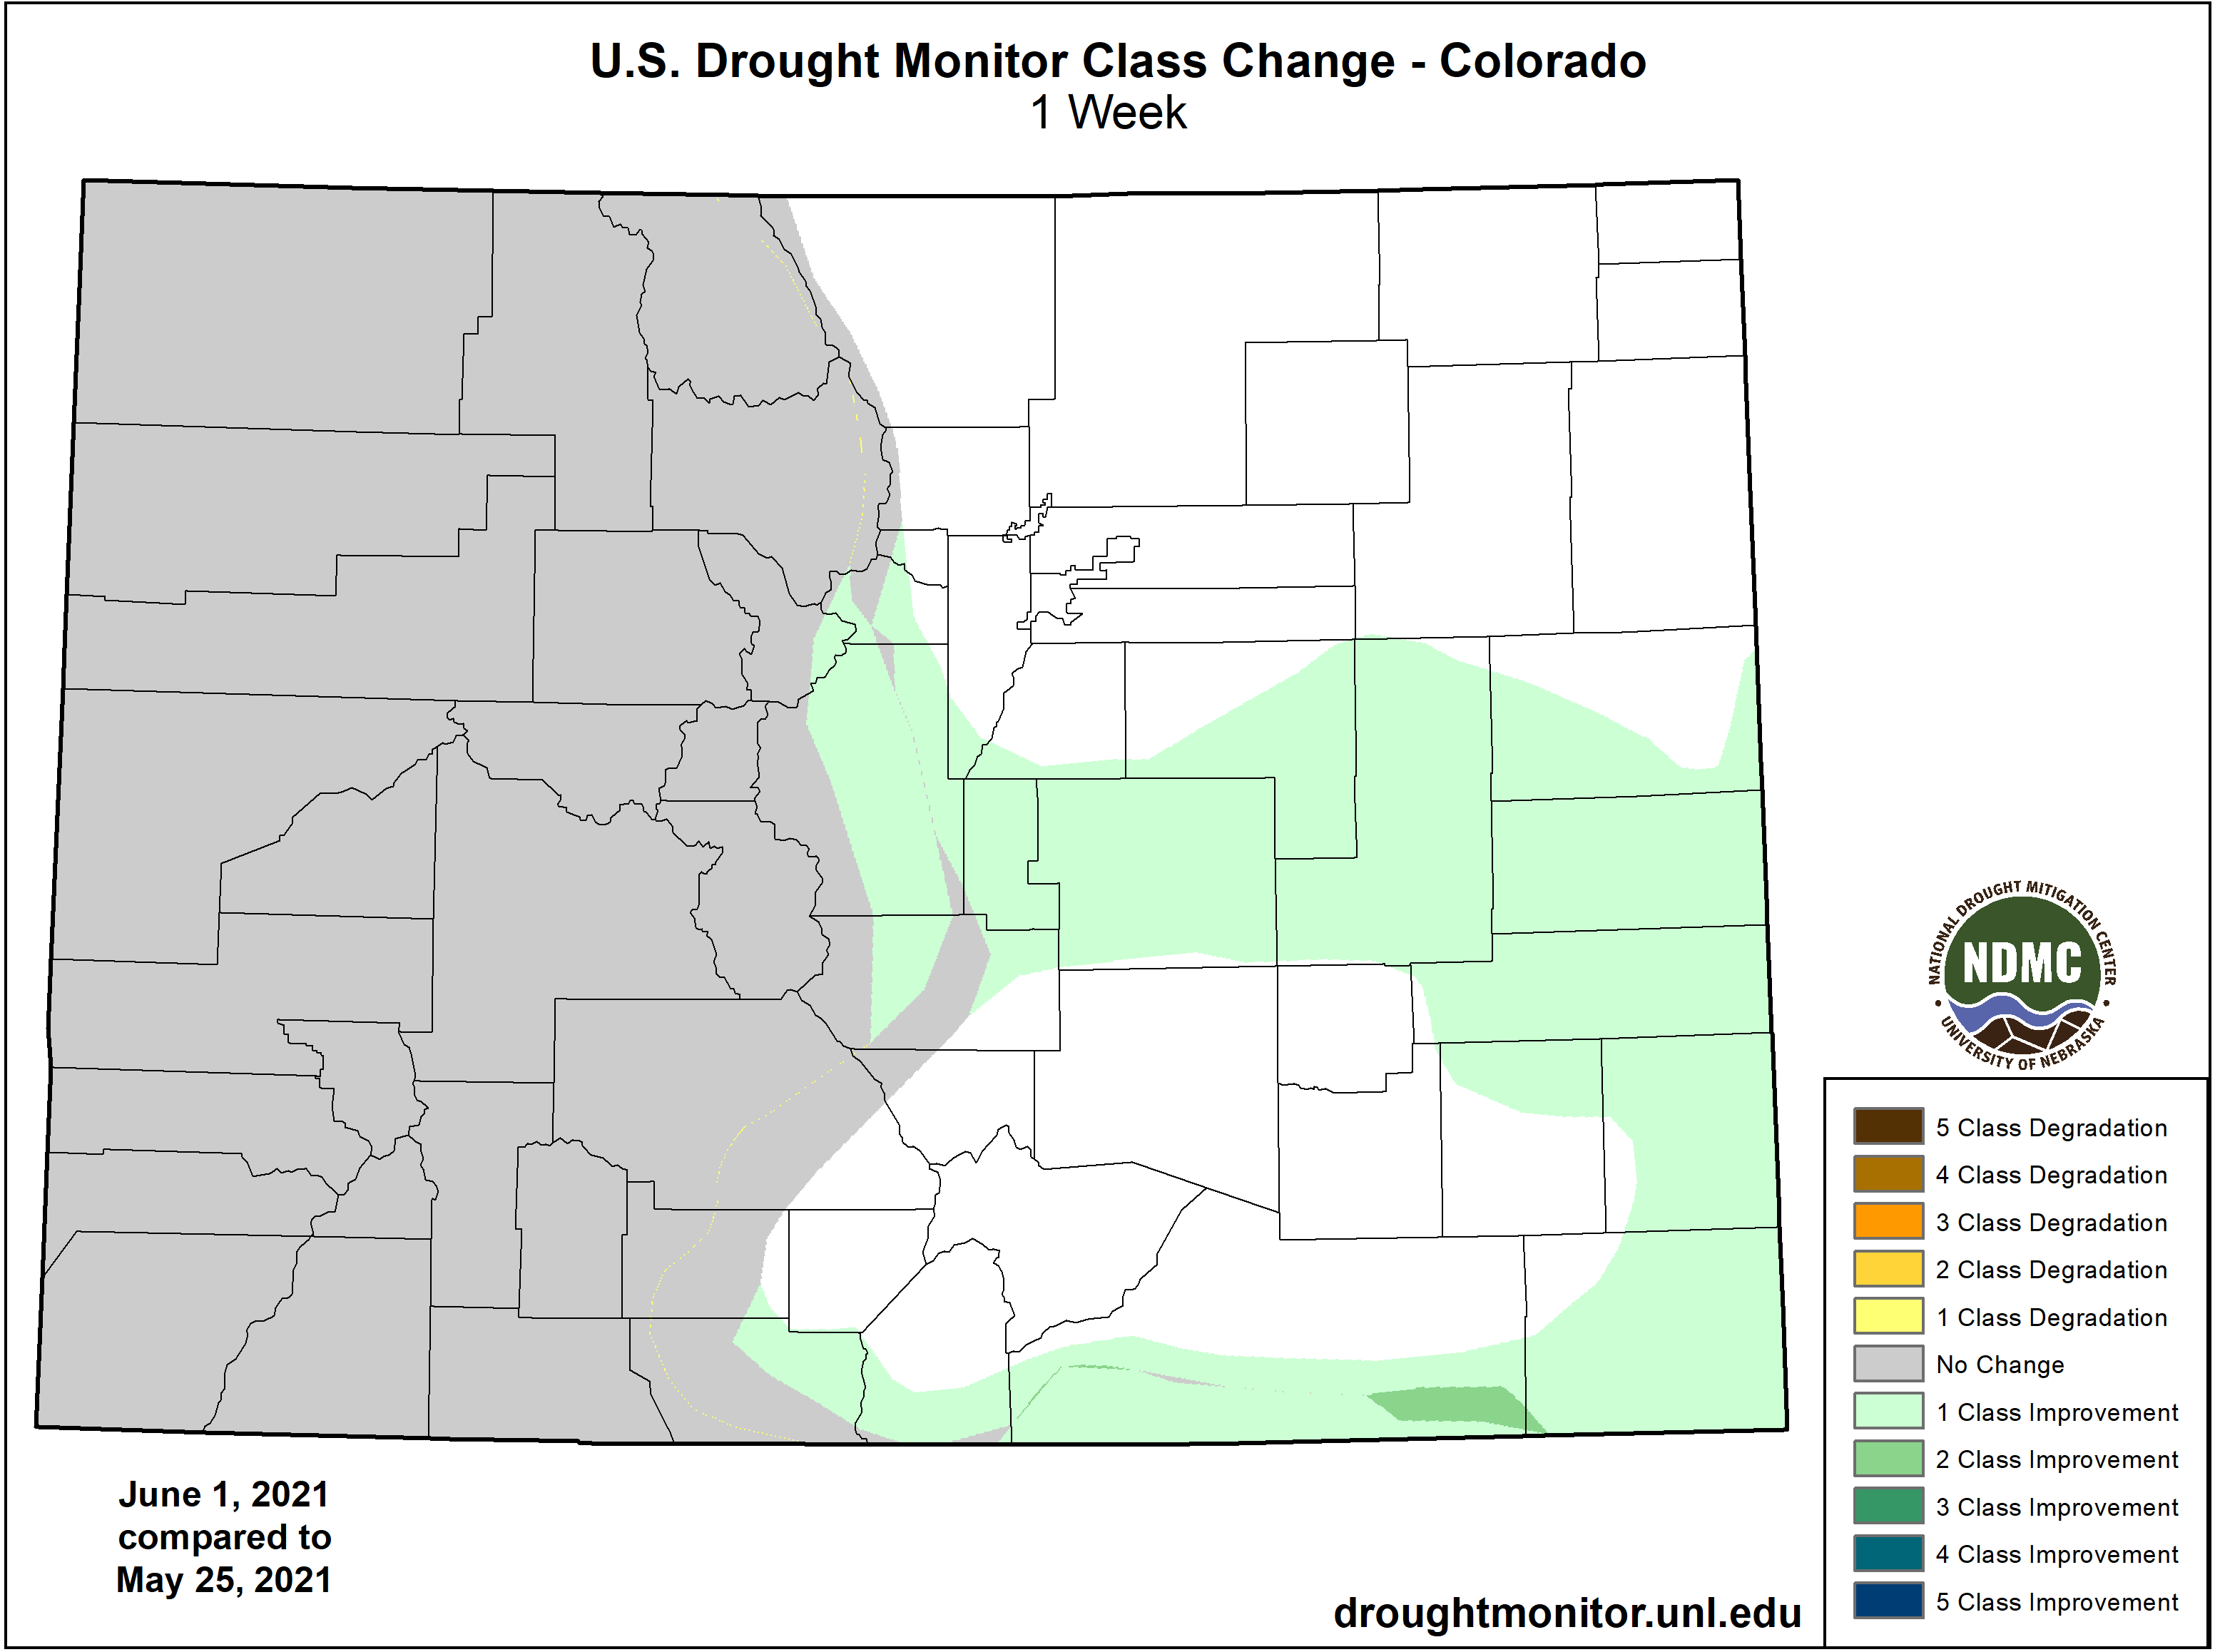 MAP Drought change between May 25 and June 1, 2021 - NDMC